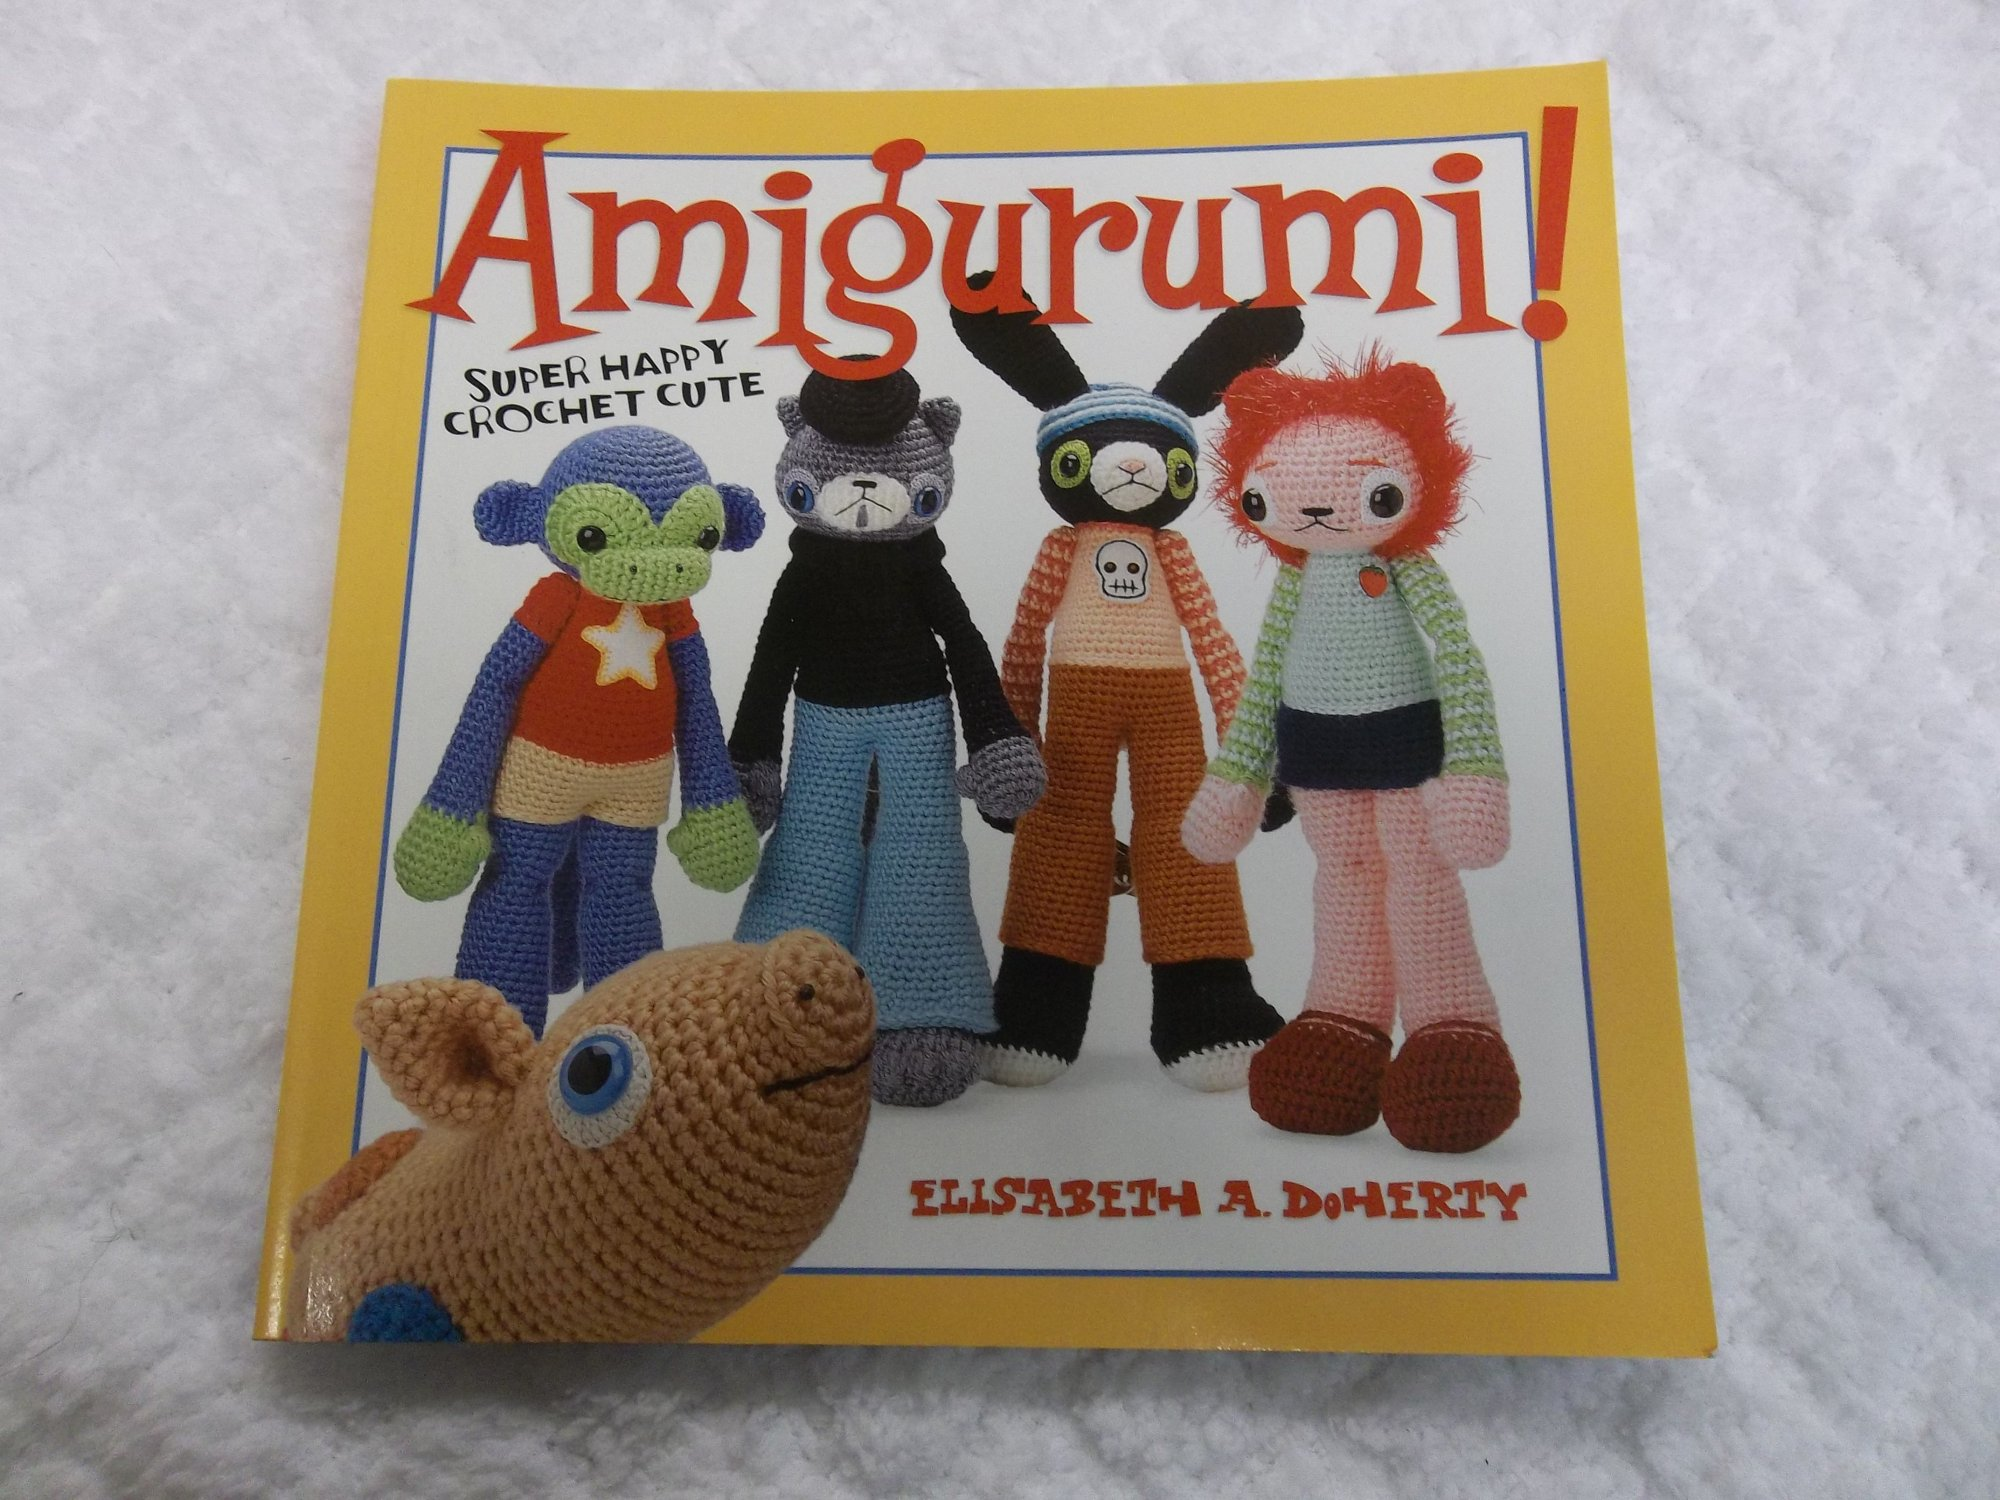 Amigurami- Super Happy Crochet Cute